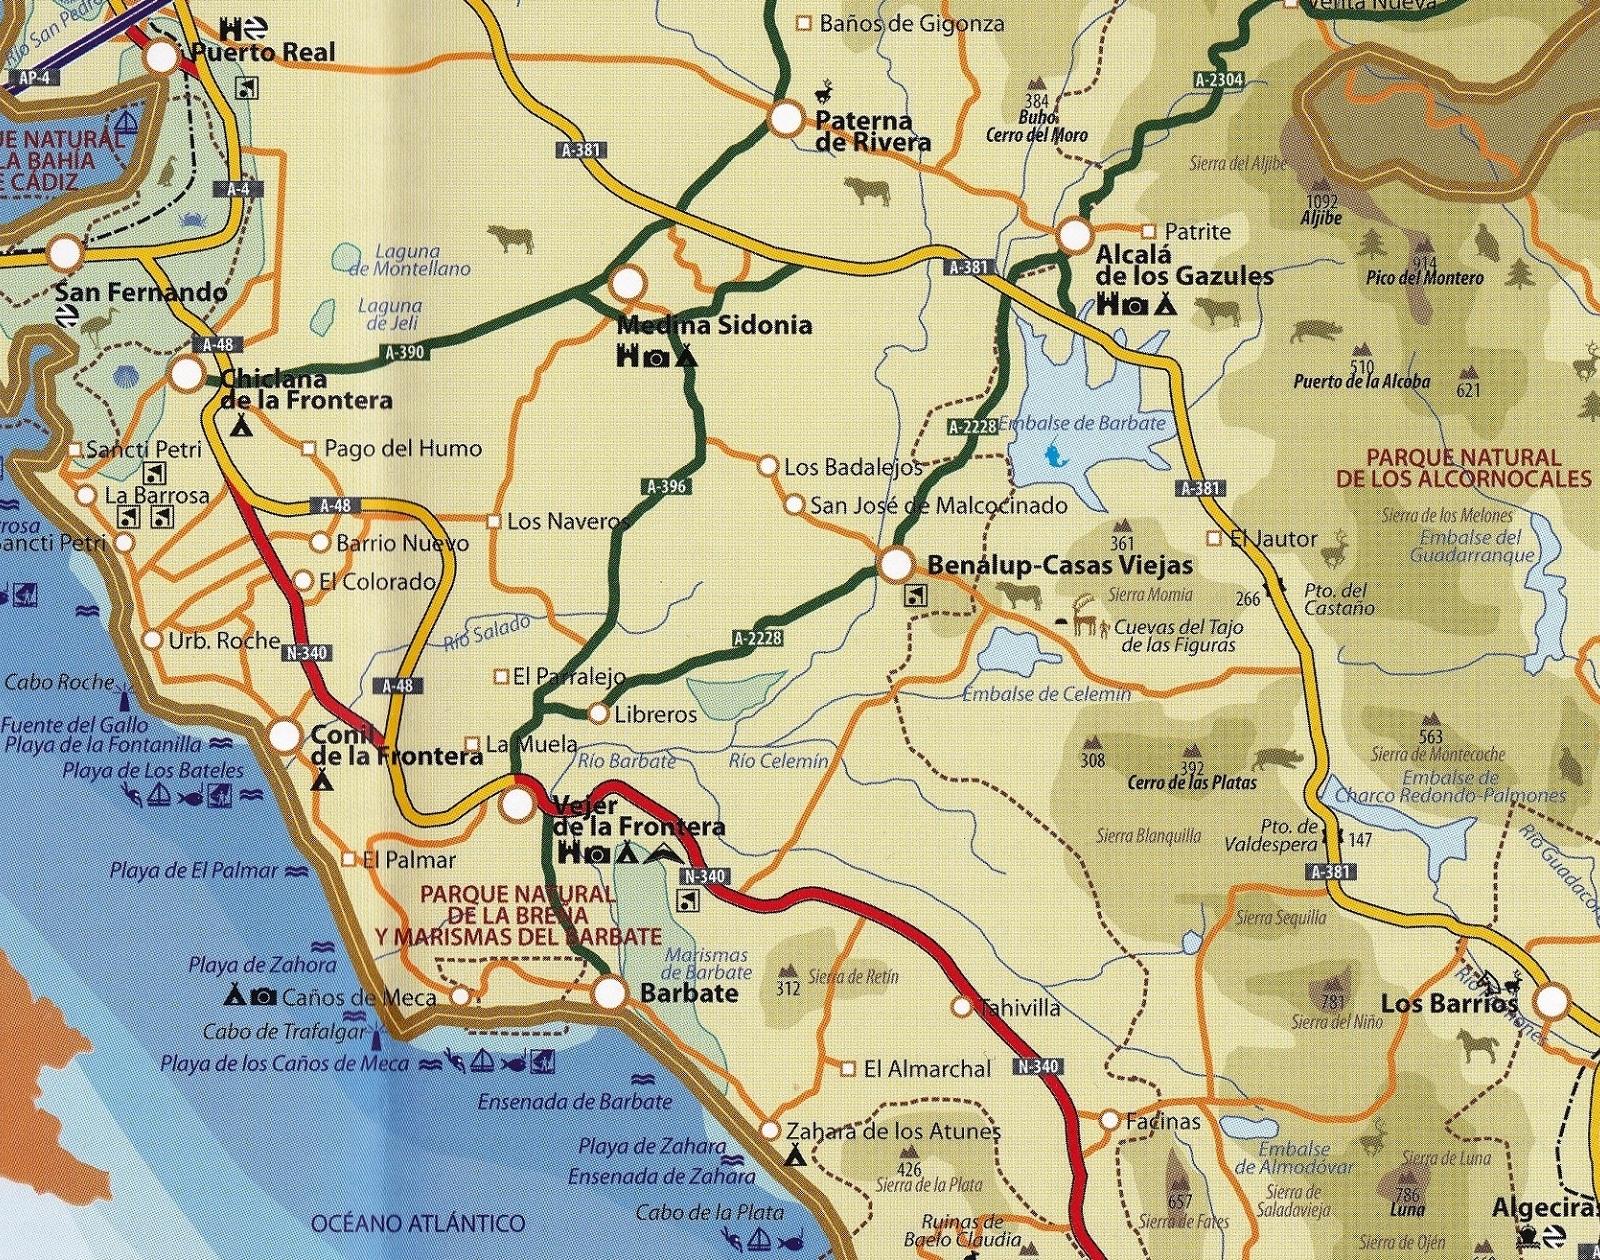 Mapa de la Janda y Cabo Trafalgar